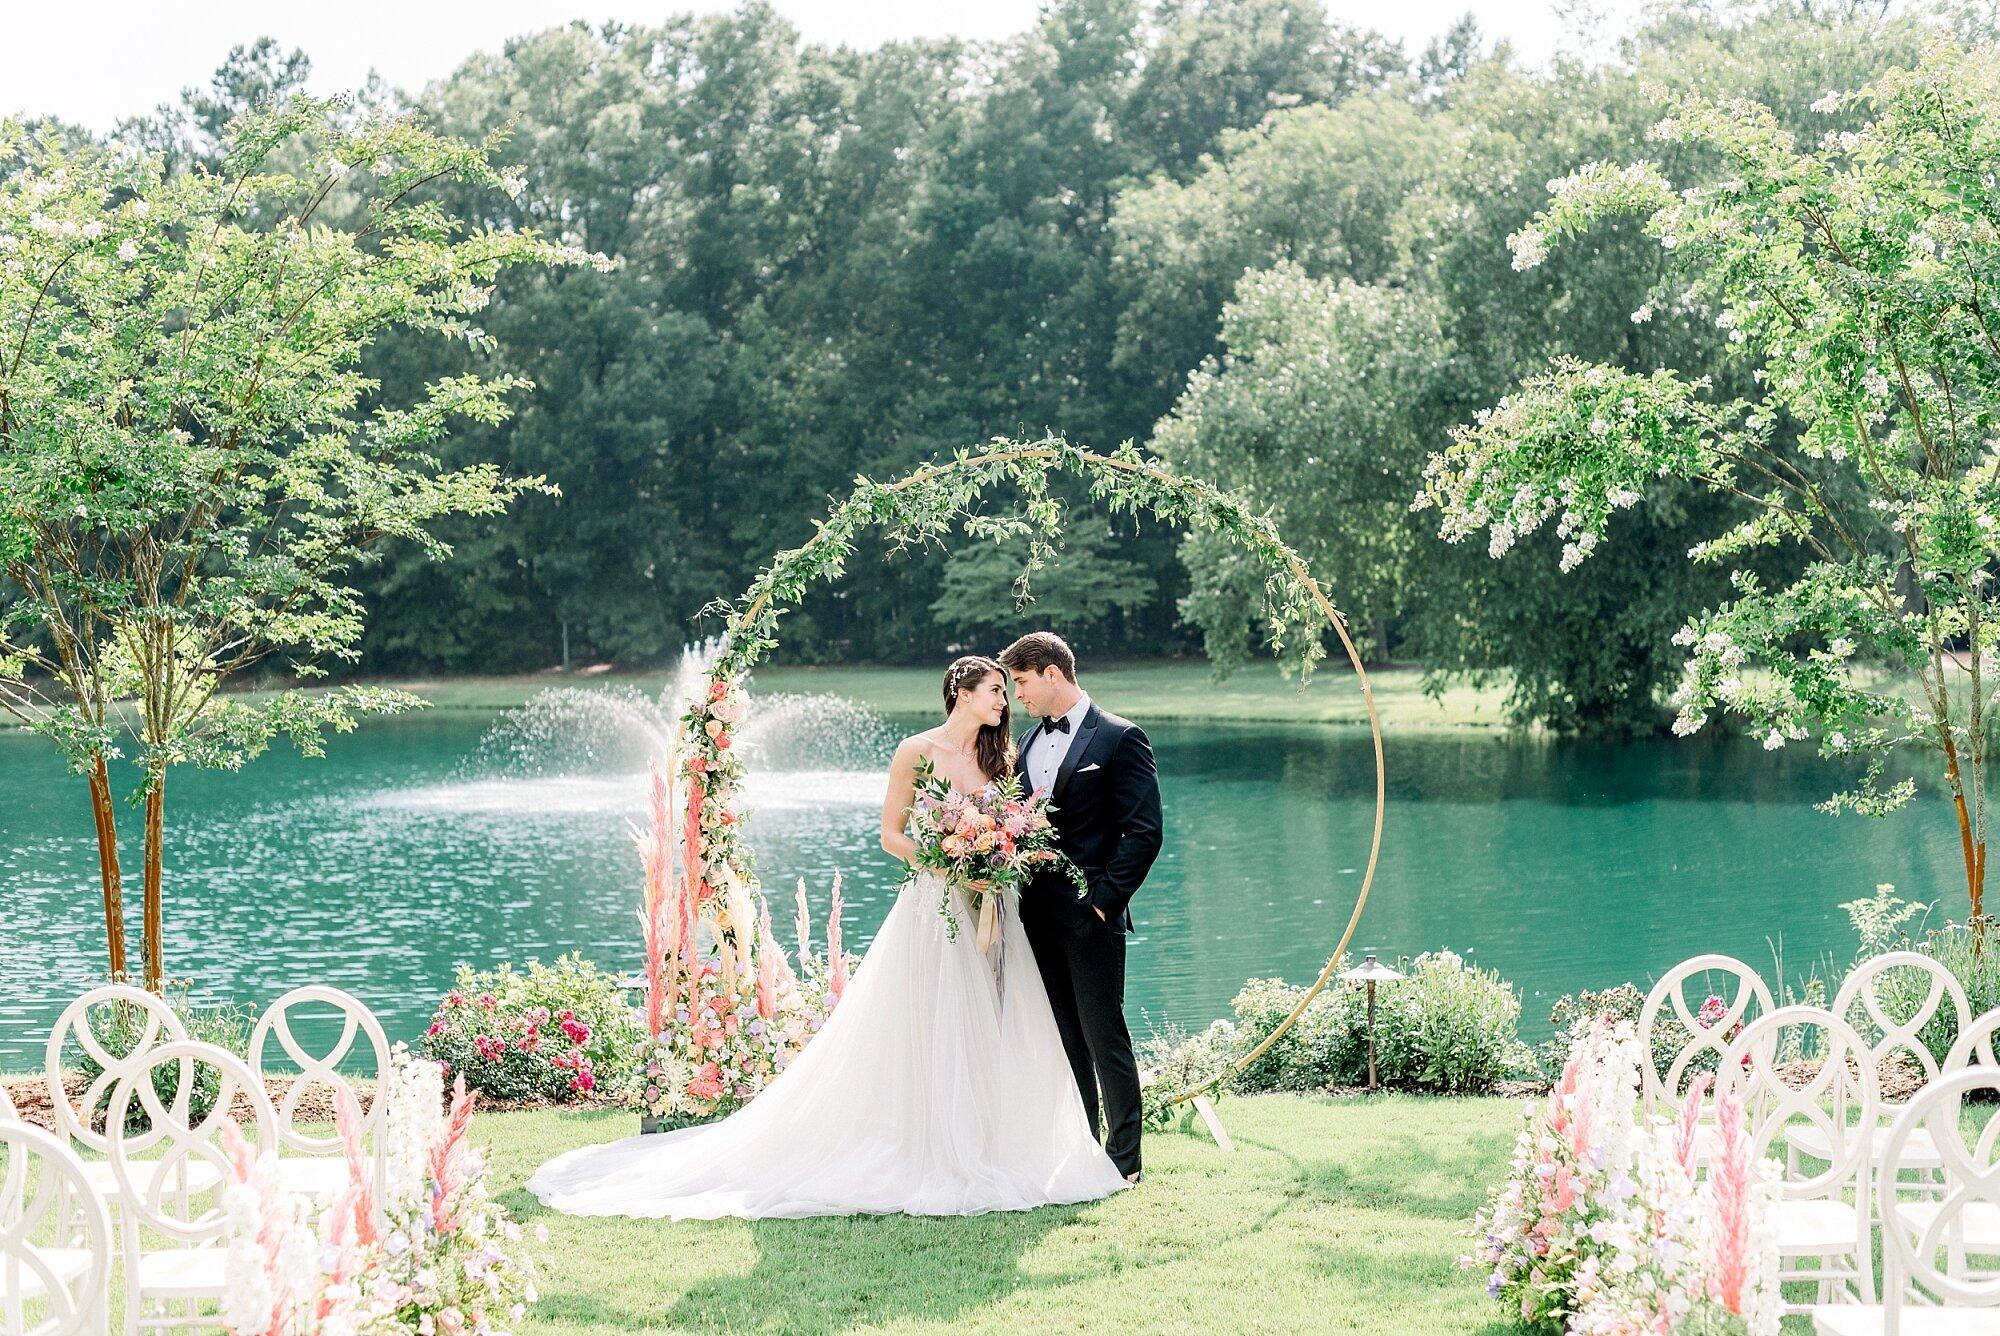 Walnut-Hill-Wedding-Photographer-Raleigh-Fabiana-Skubic.jpg